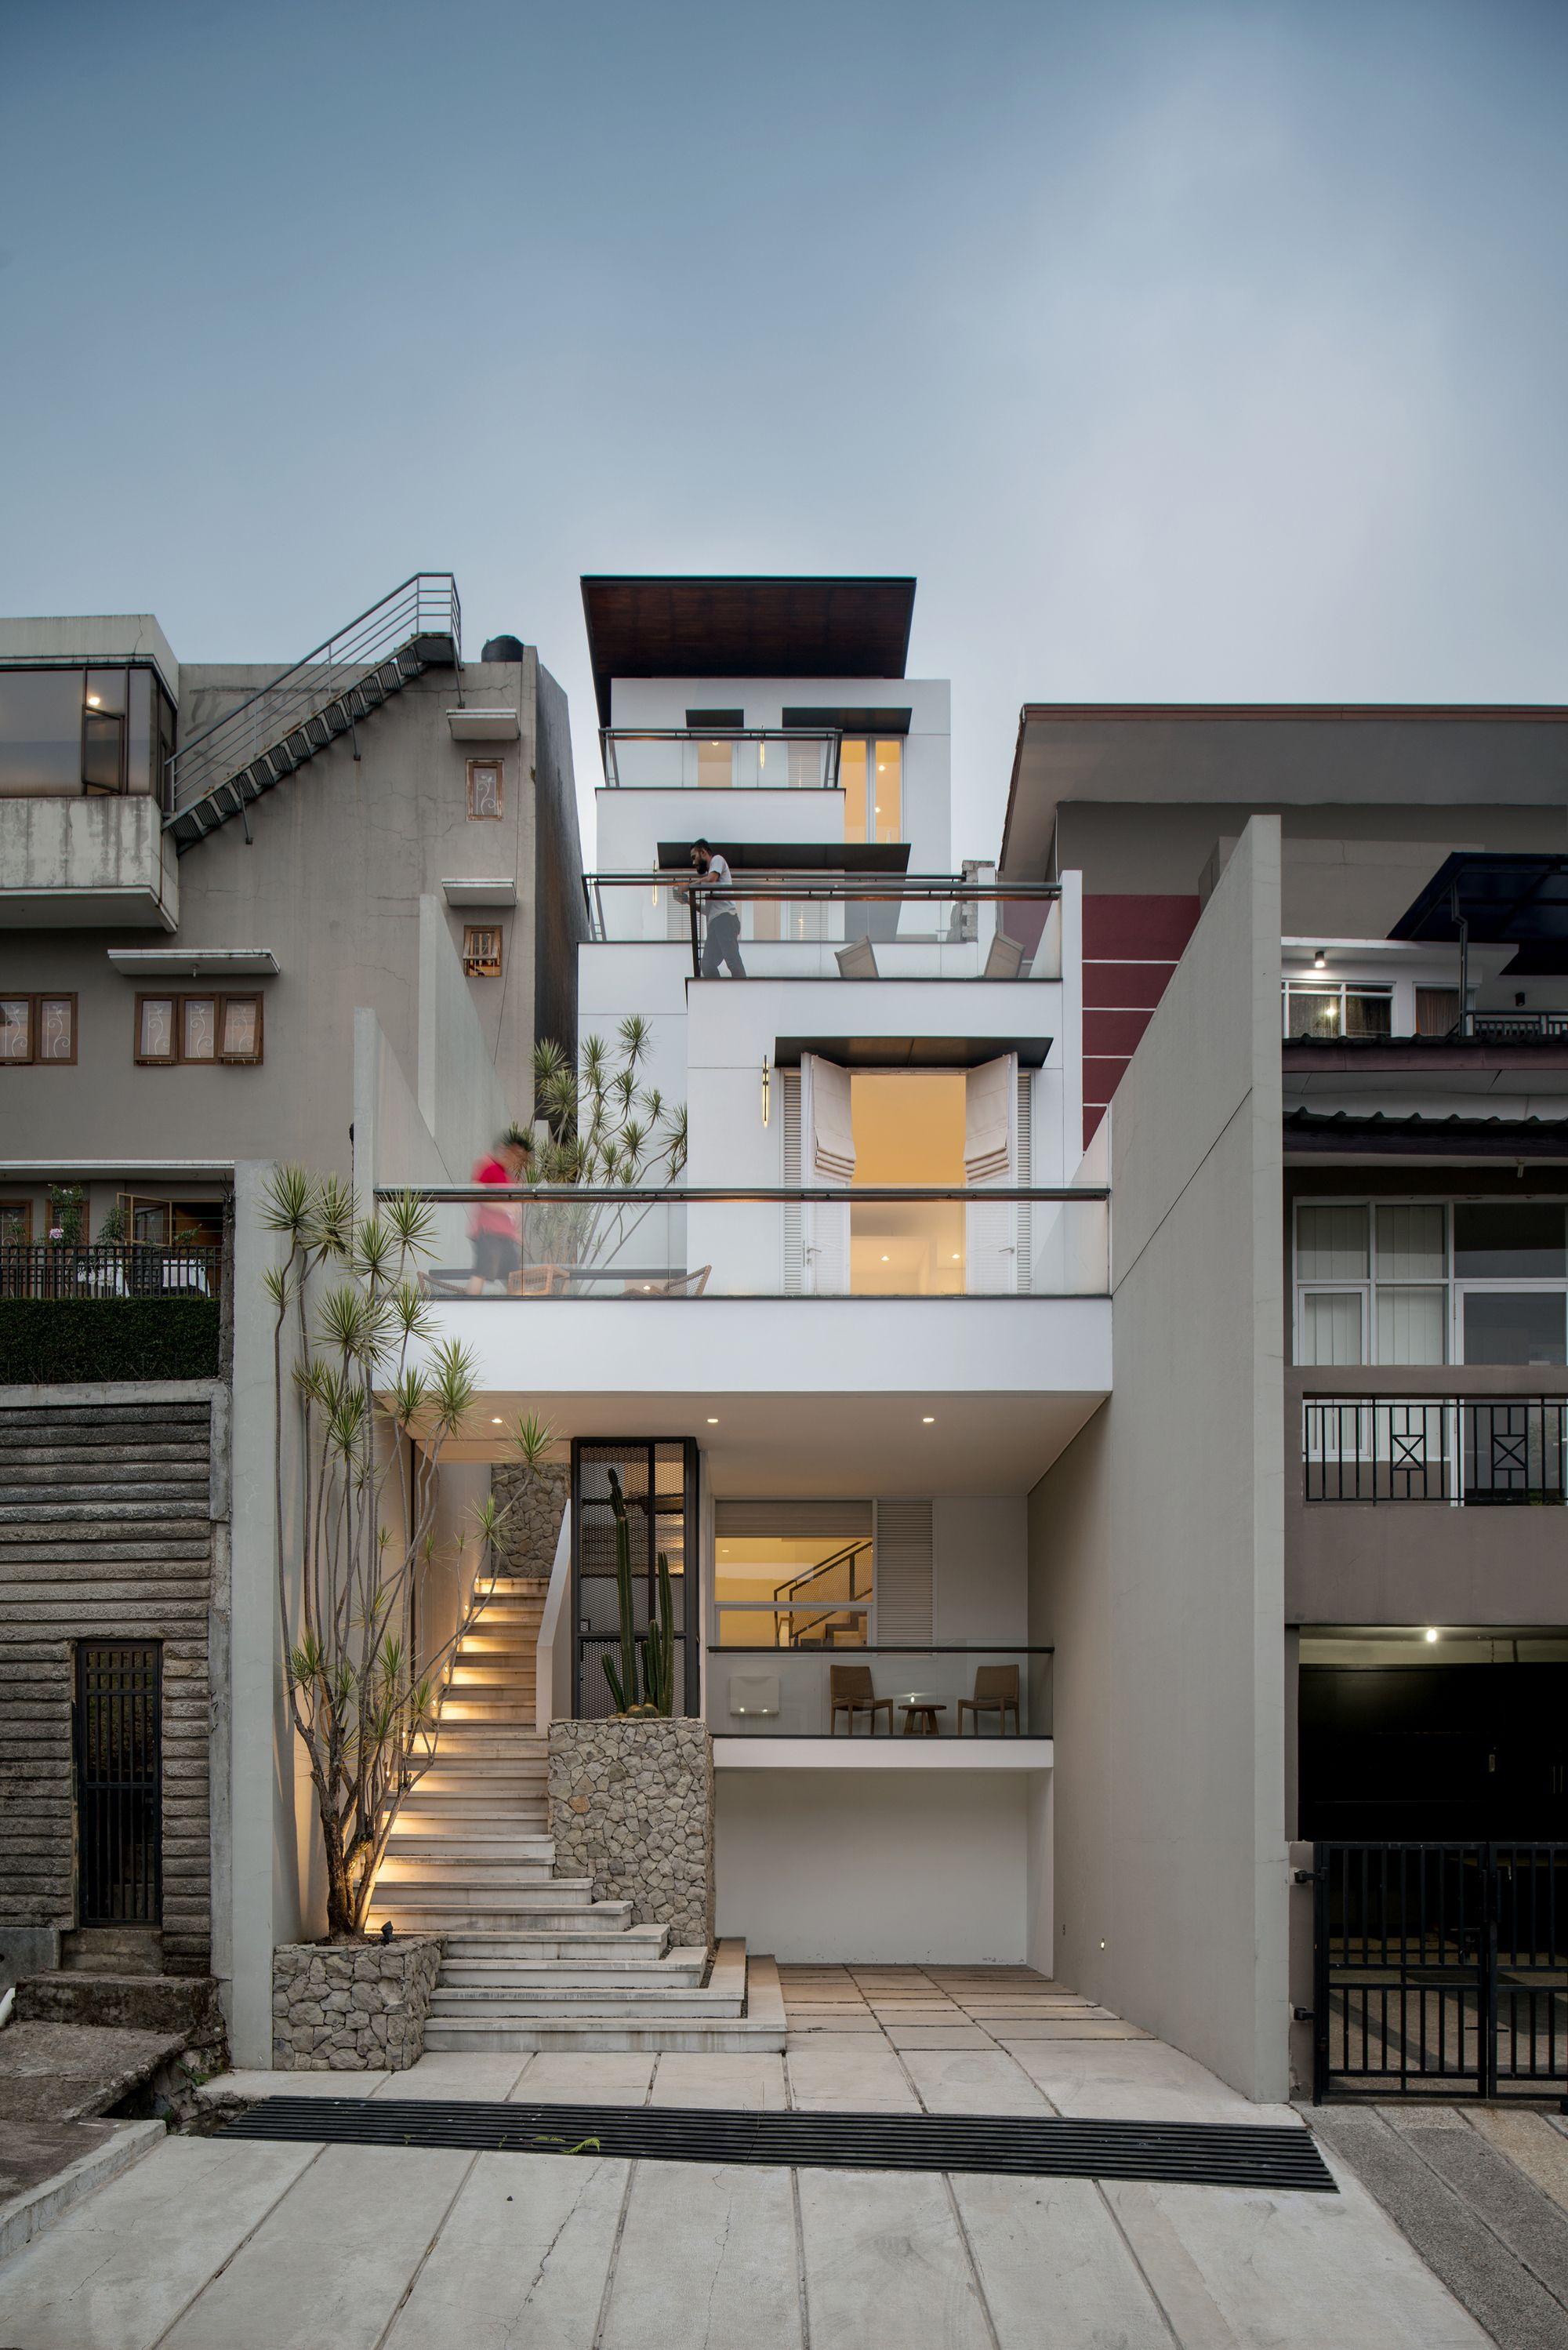 49 Most Popular Modern Dream House Exterior Design Ideas 3 In 2020: Tiny House Design, Modern House Design, House Front Design